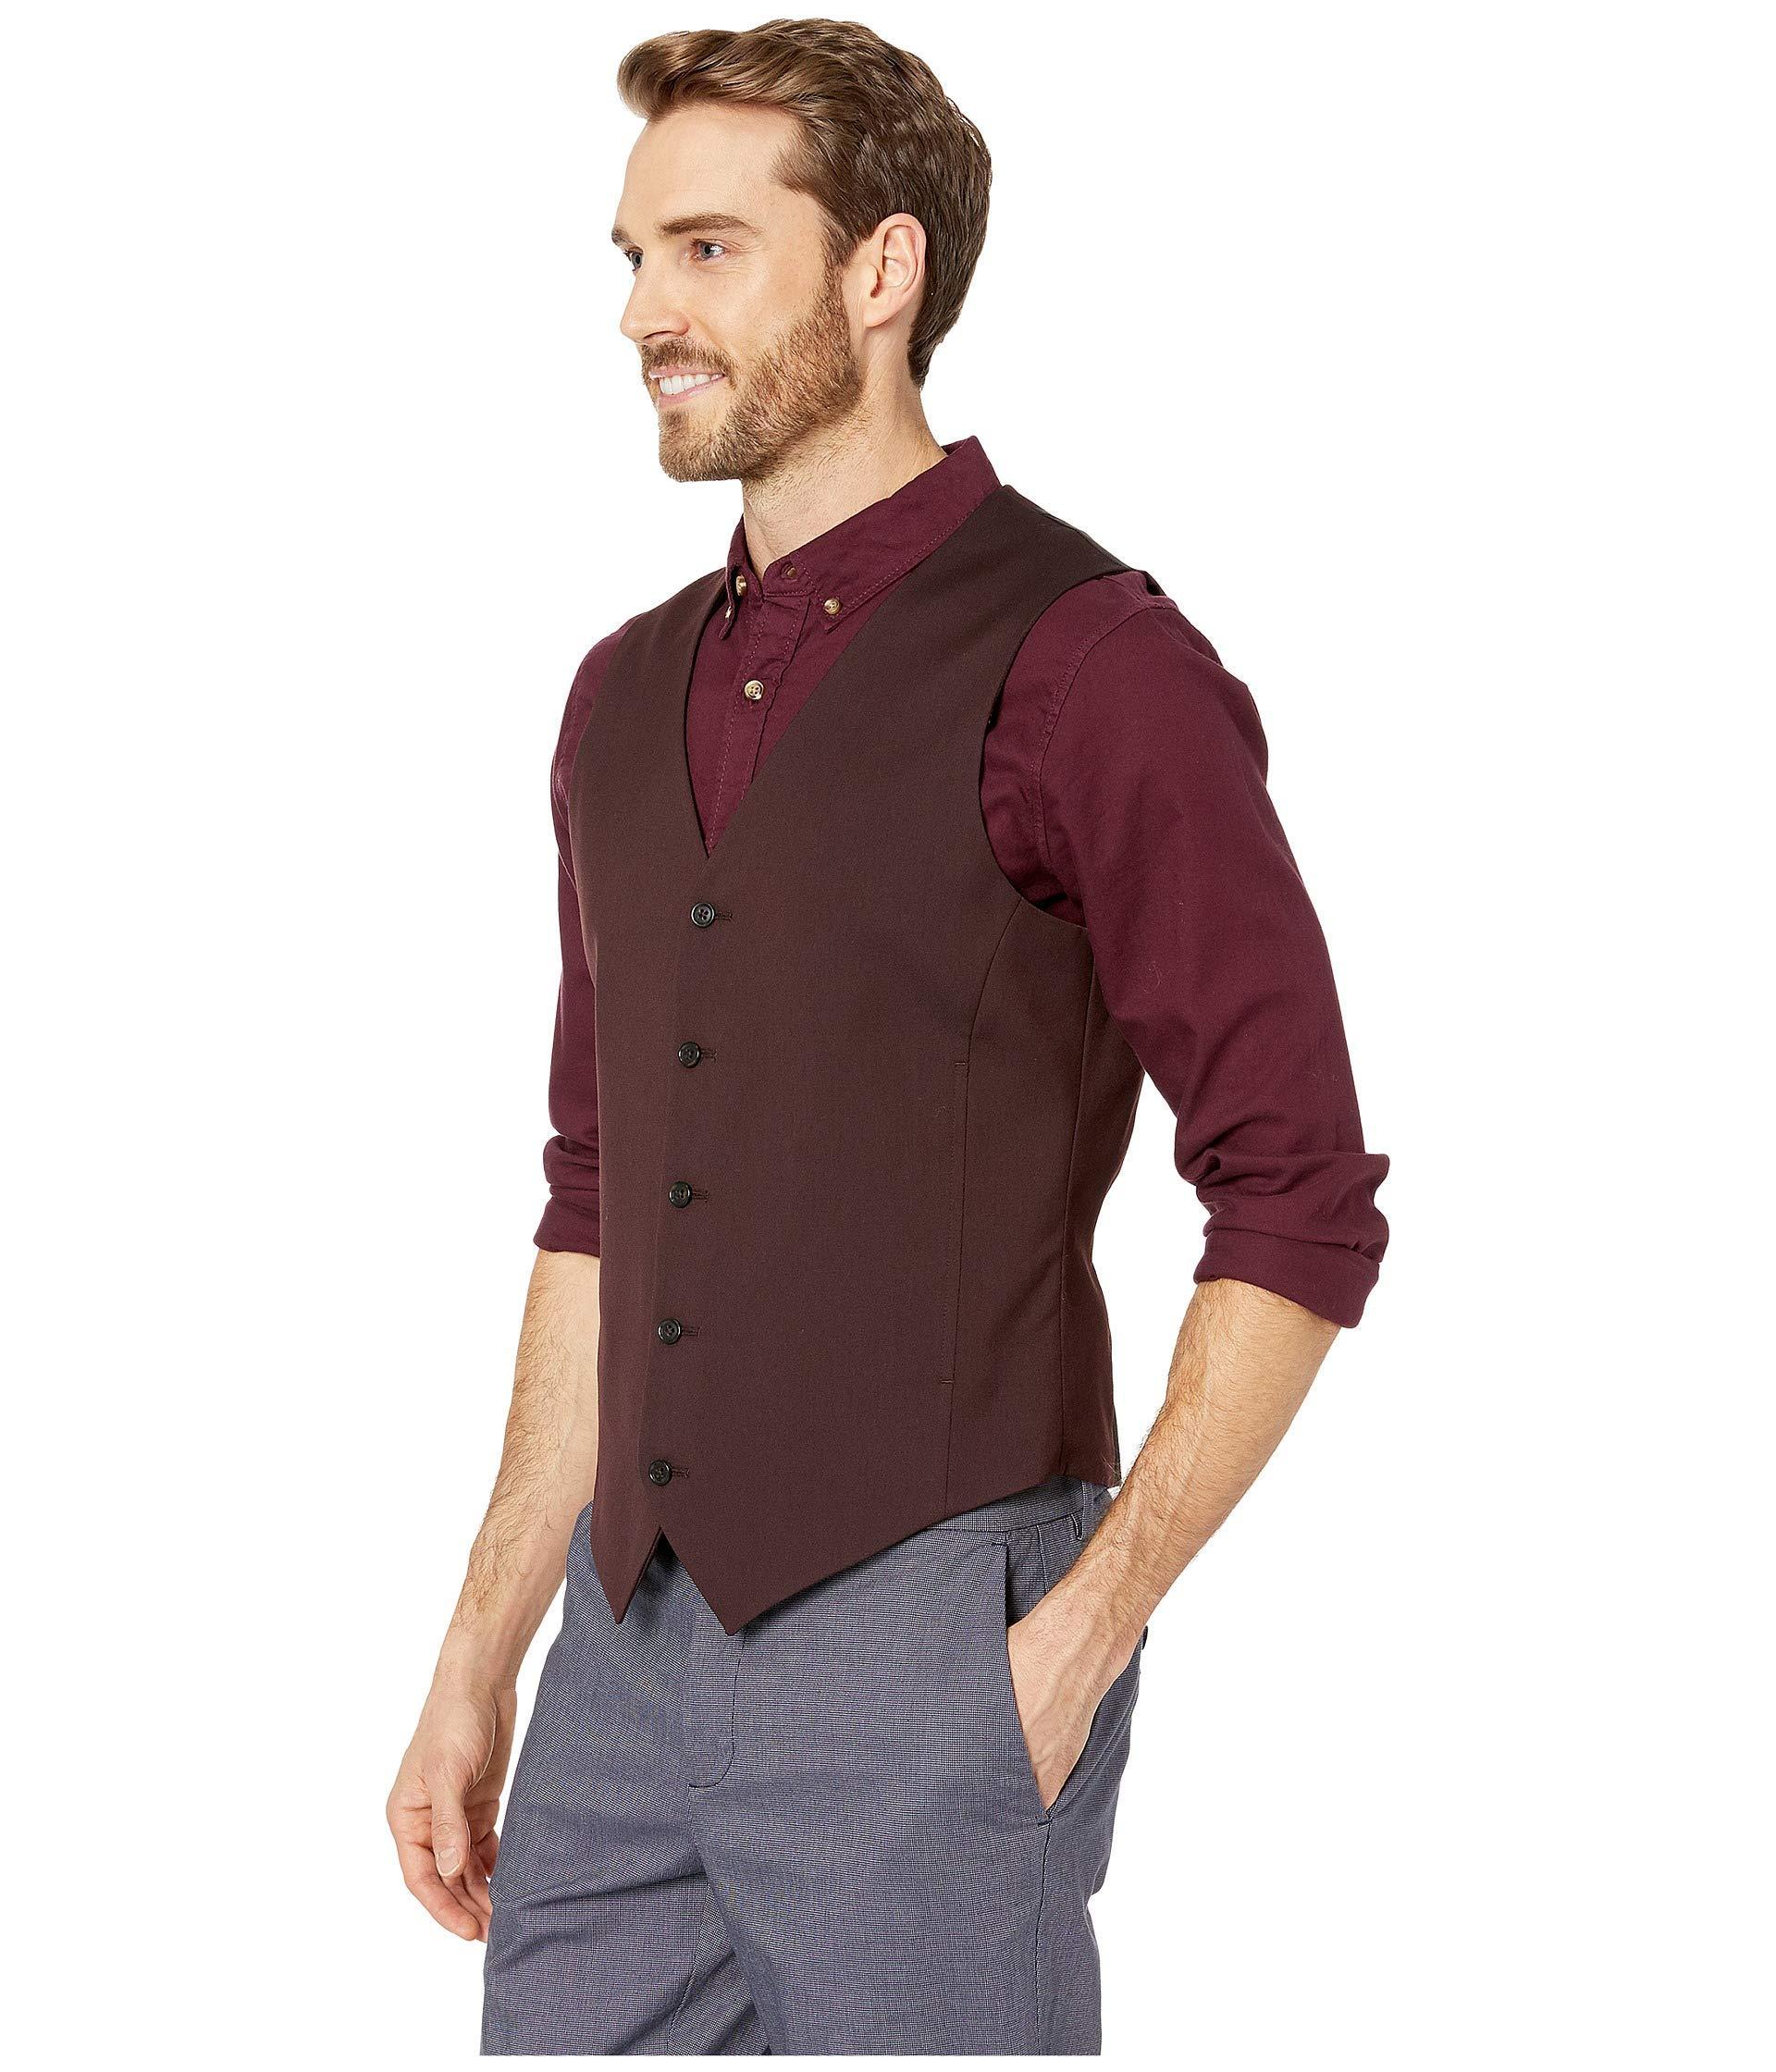 a57eb24cc1 Lyst - Perry Ellis Slim Fit Stretch Twill Suit Vest for Men